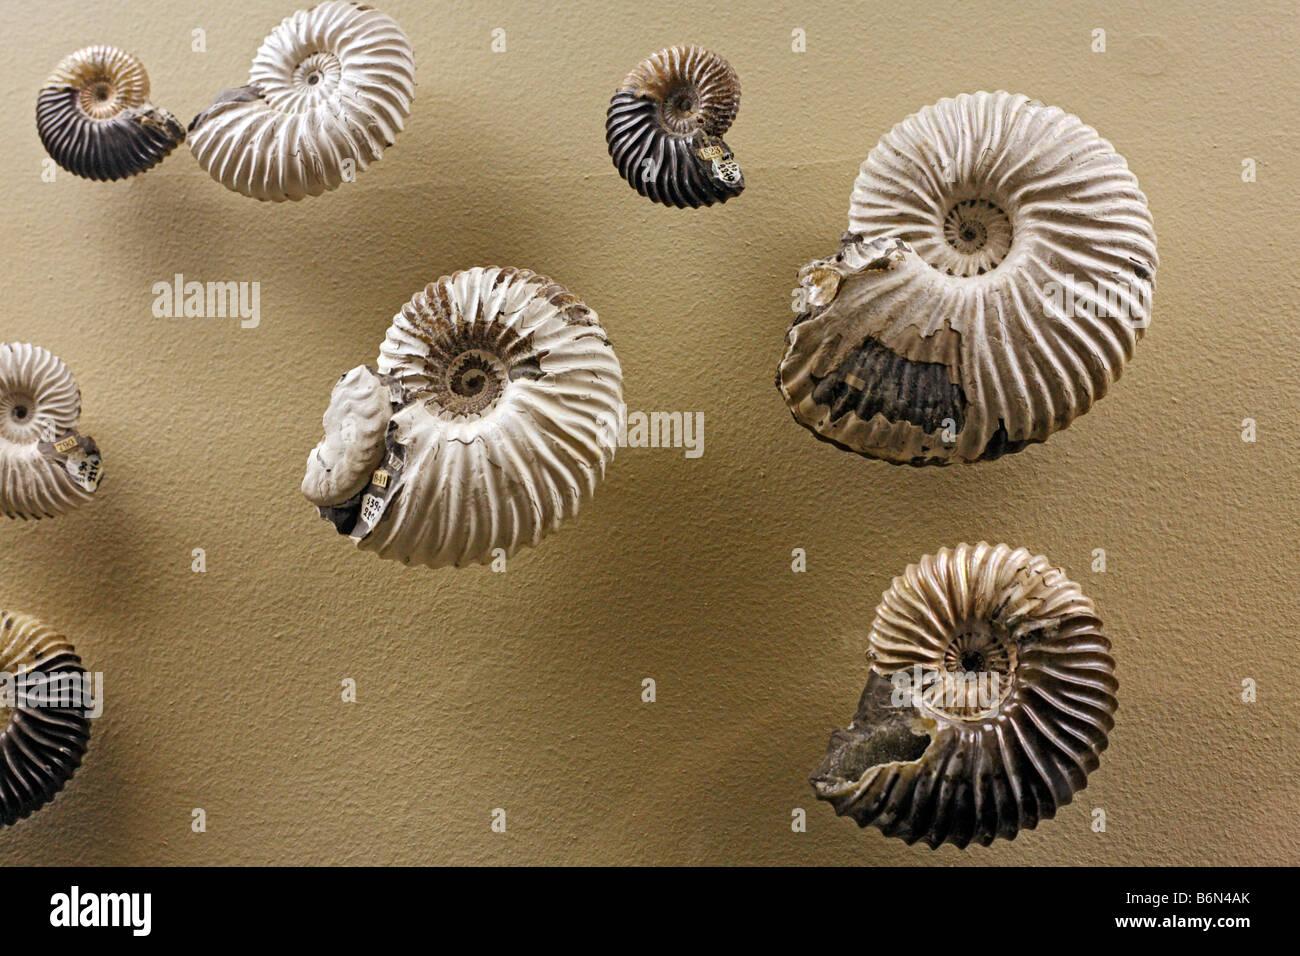 Les fossiles (Speetoniceras versicolor), musée de paléontologie, Moscou, Russie Photo Stock